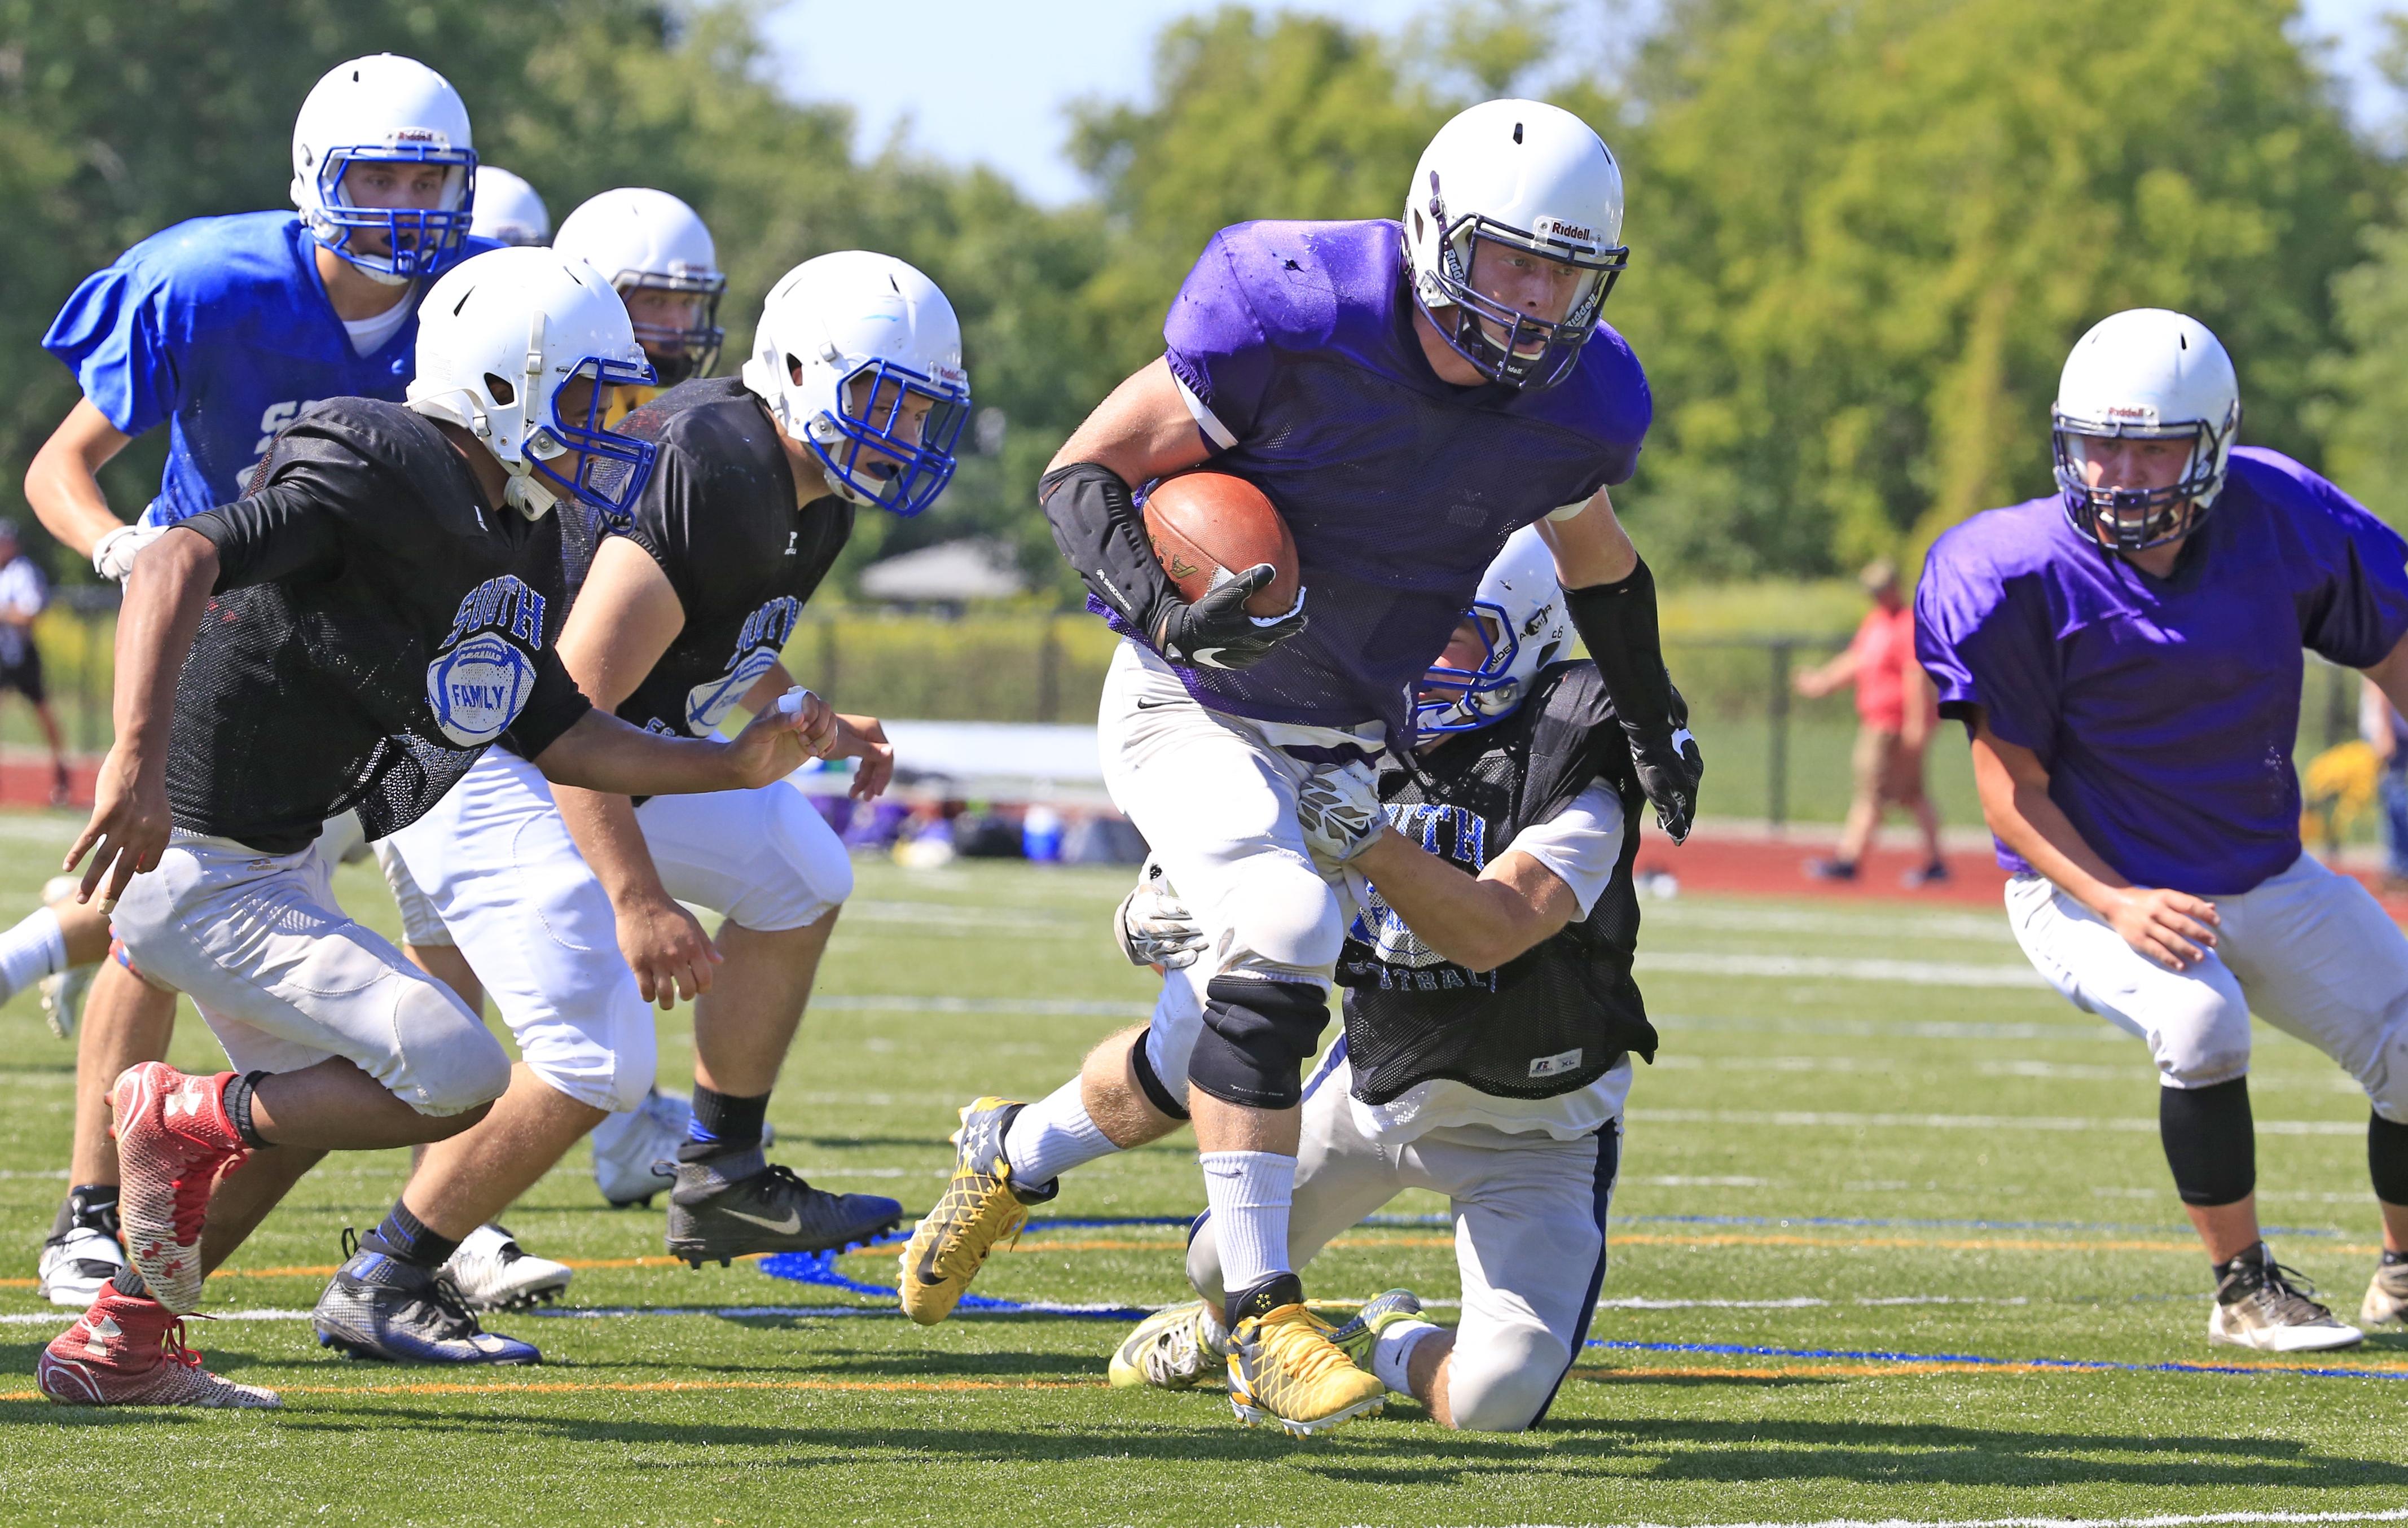 Springville's Ian Baker broke the school record for career rushing yardage. (Harry Scull Jr./Buffalo News)